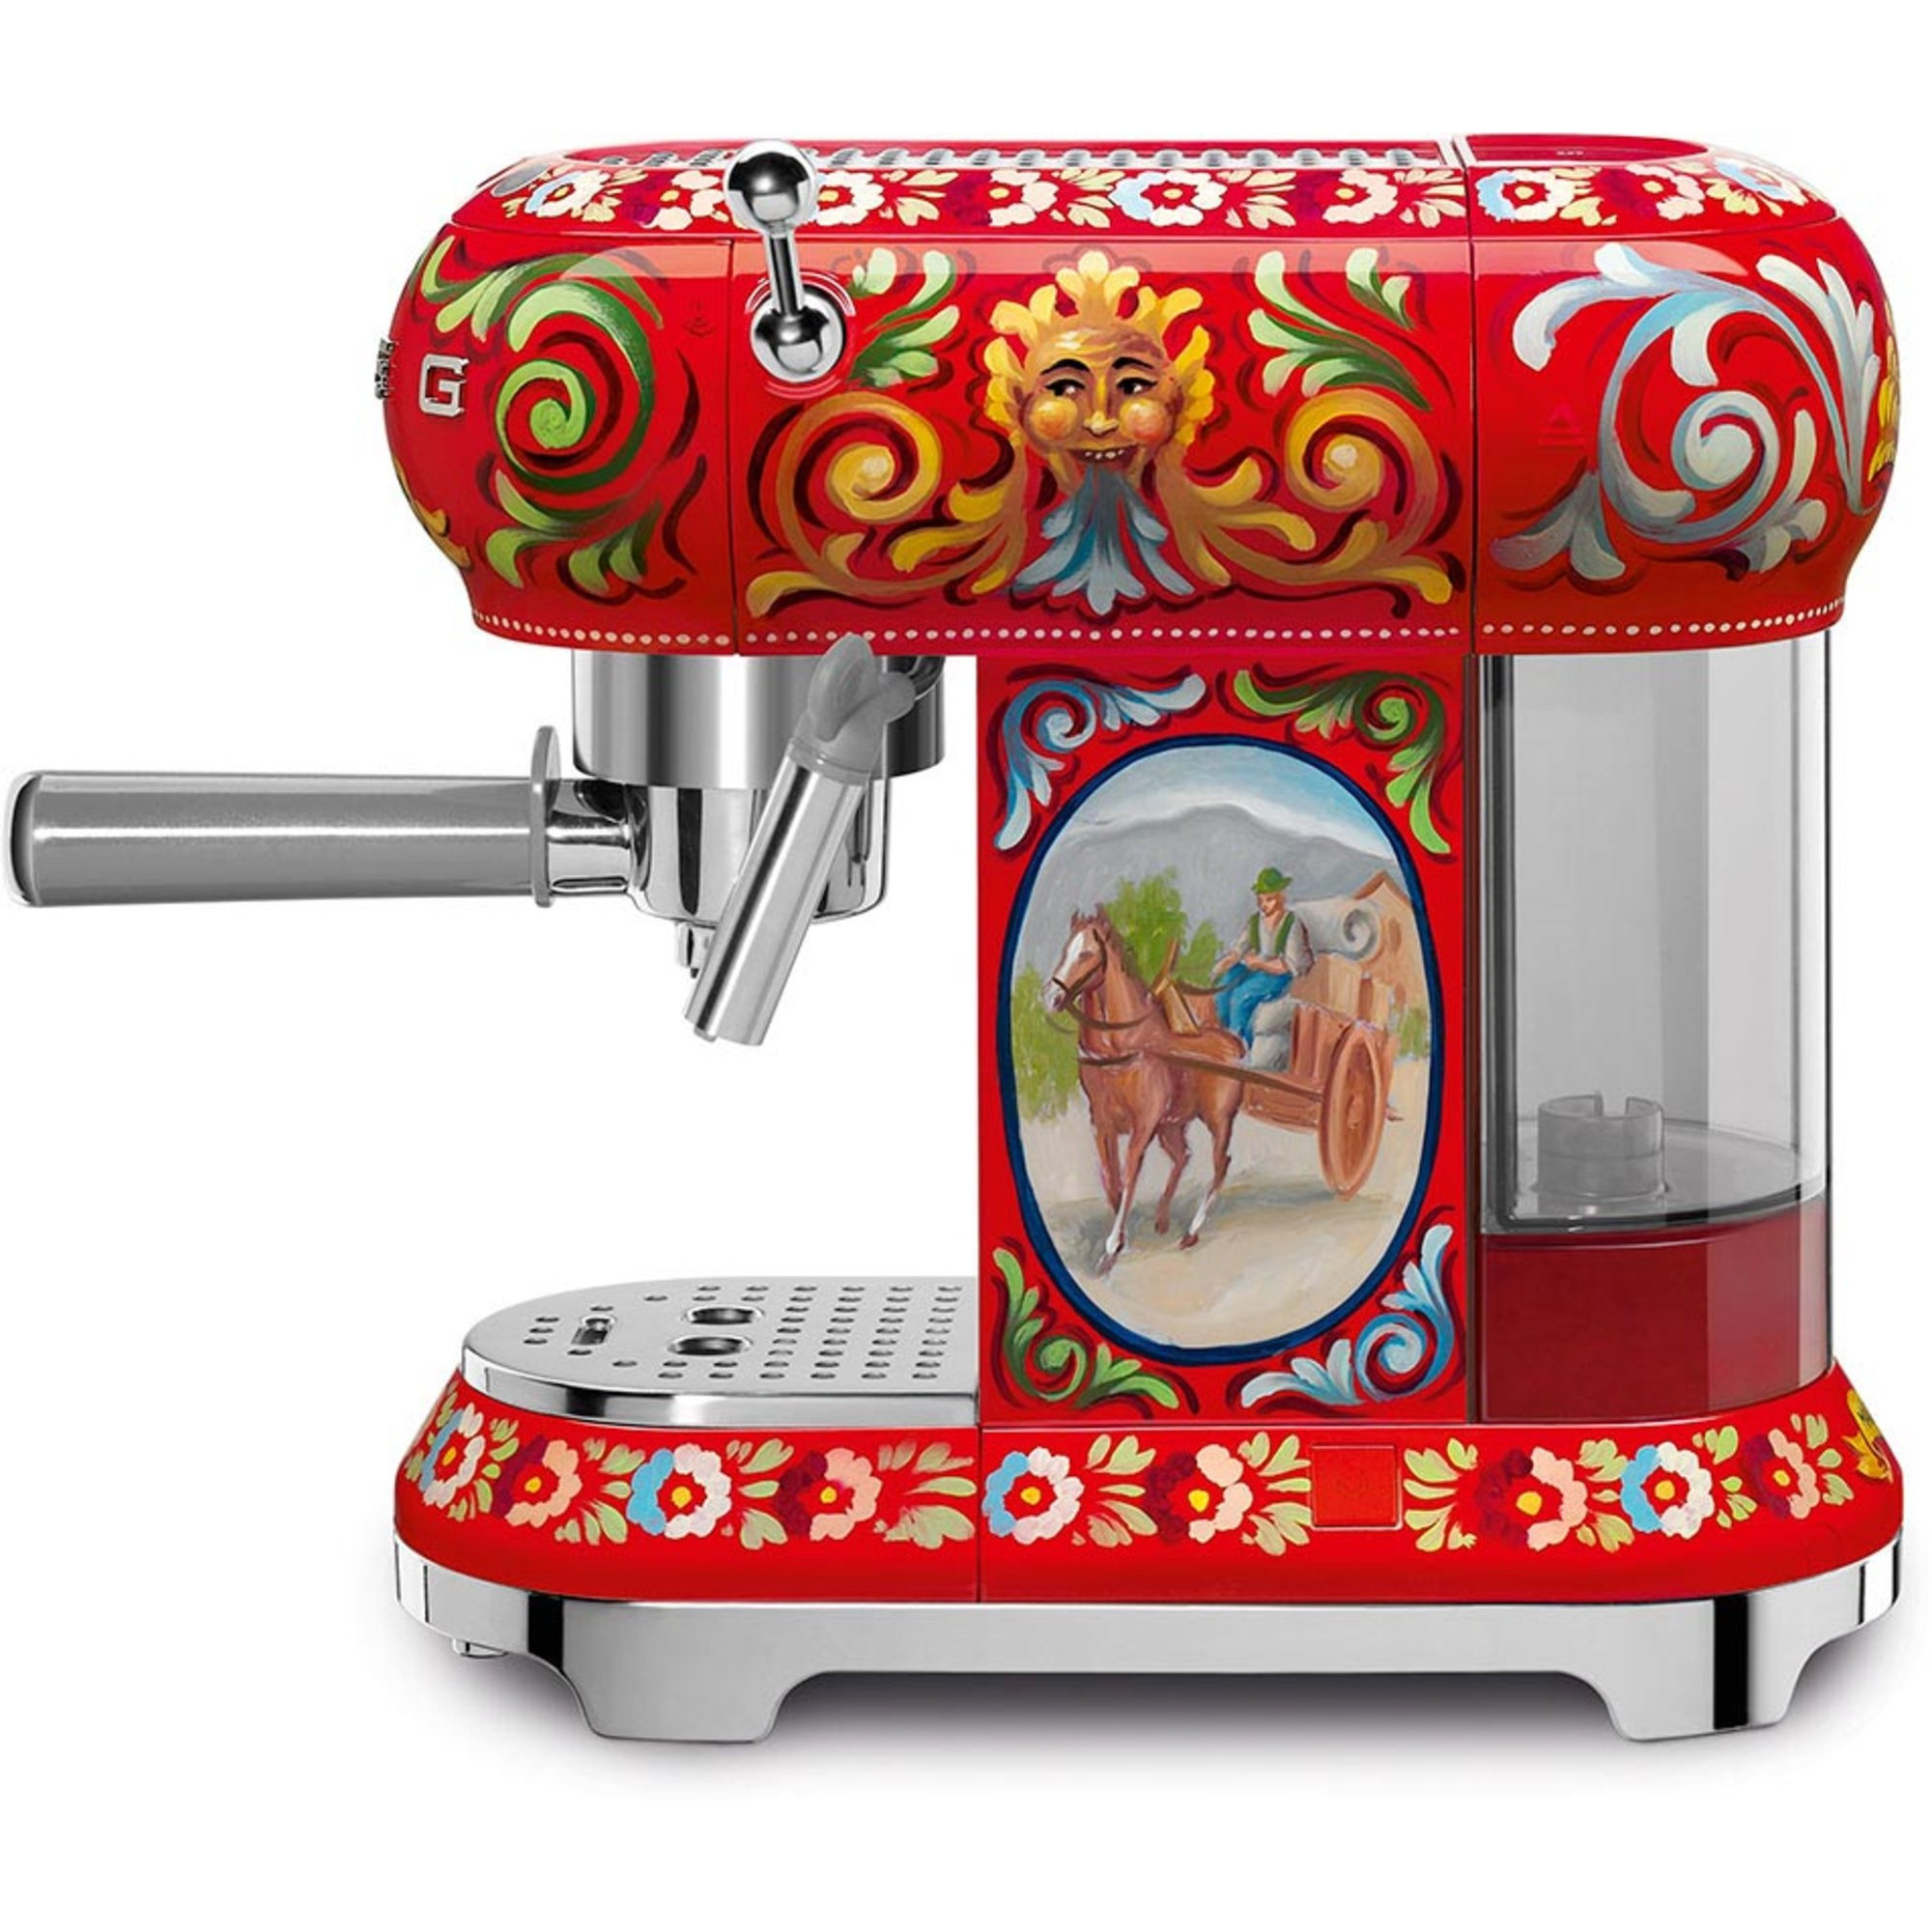 Smeg Dolce & Gabbana Espressomaskin